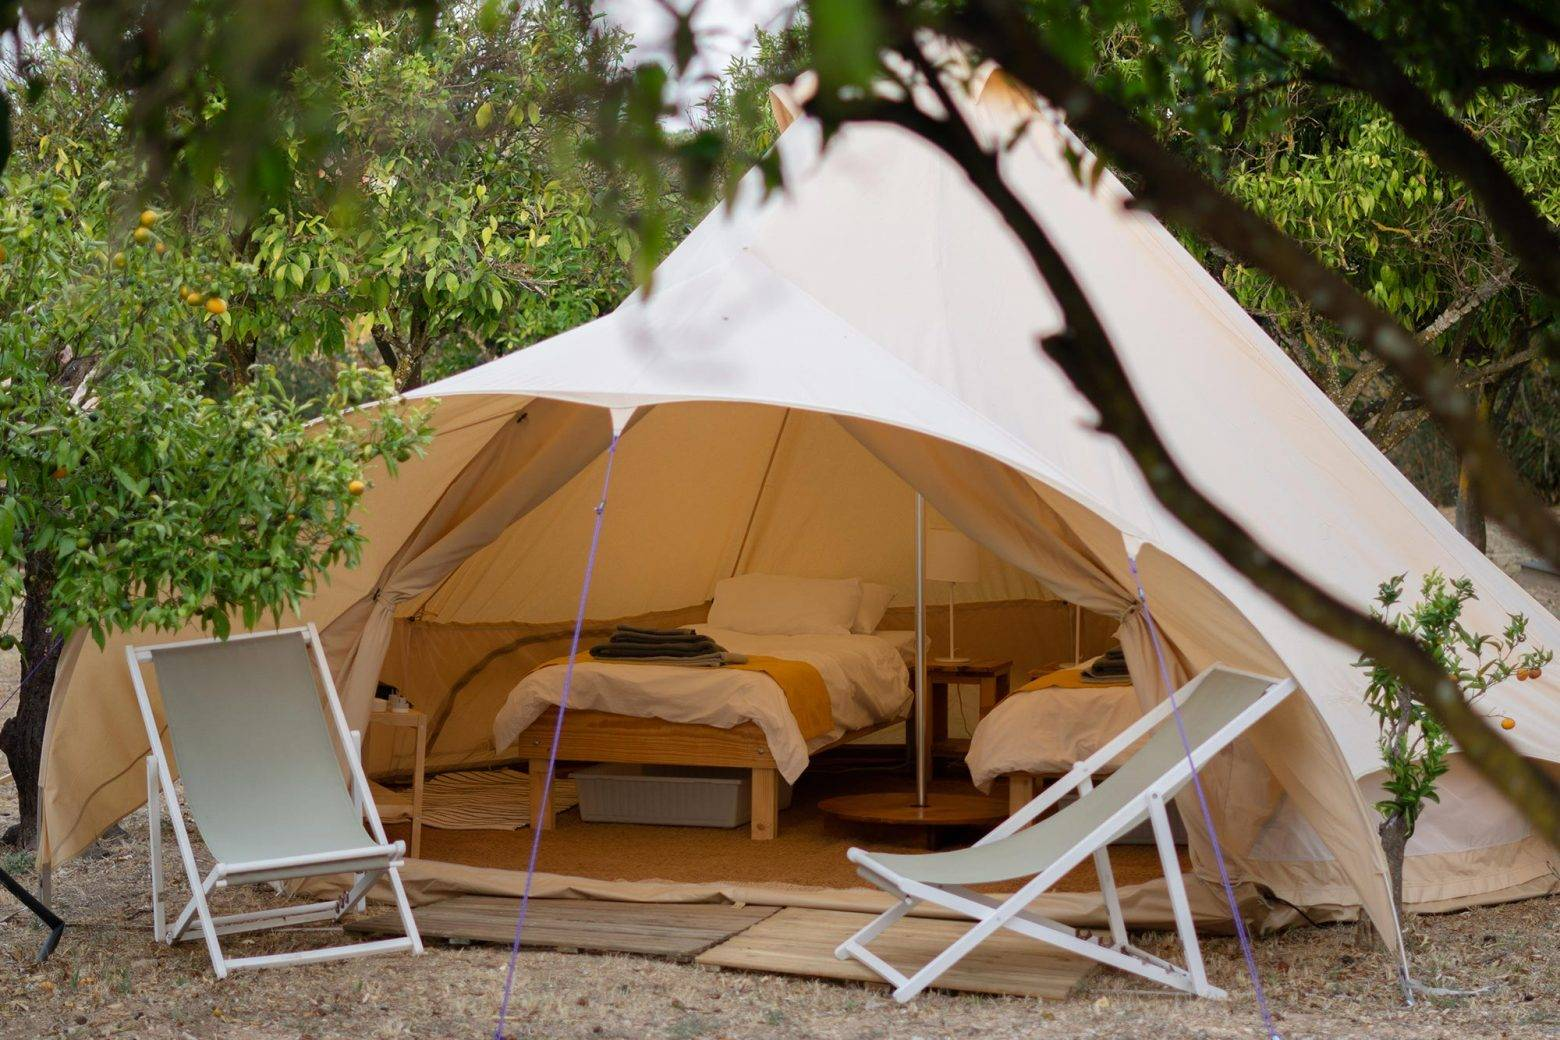 https://www.soulandsurf.com/wp-content/uploads/2021/08/portugal-tent-@joeliooo_Tent_2-e1628000741841.jpeg Image